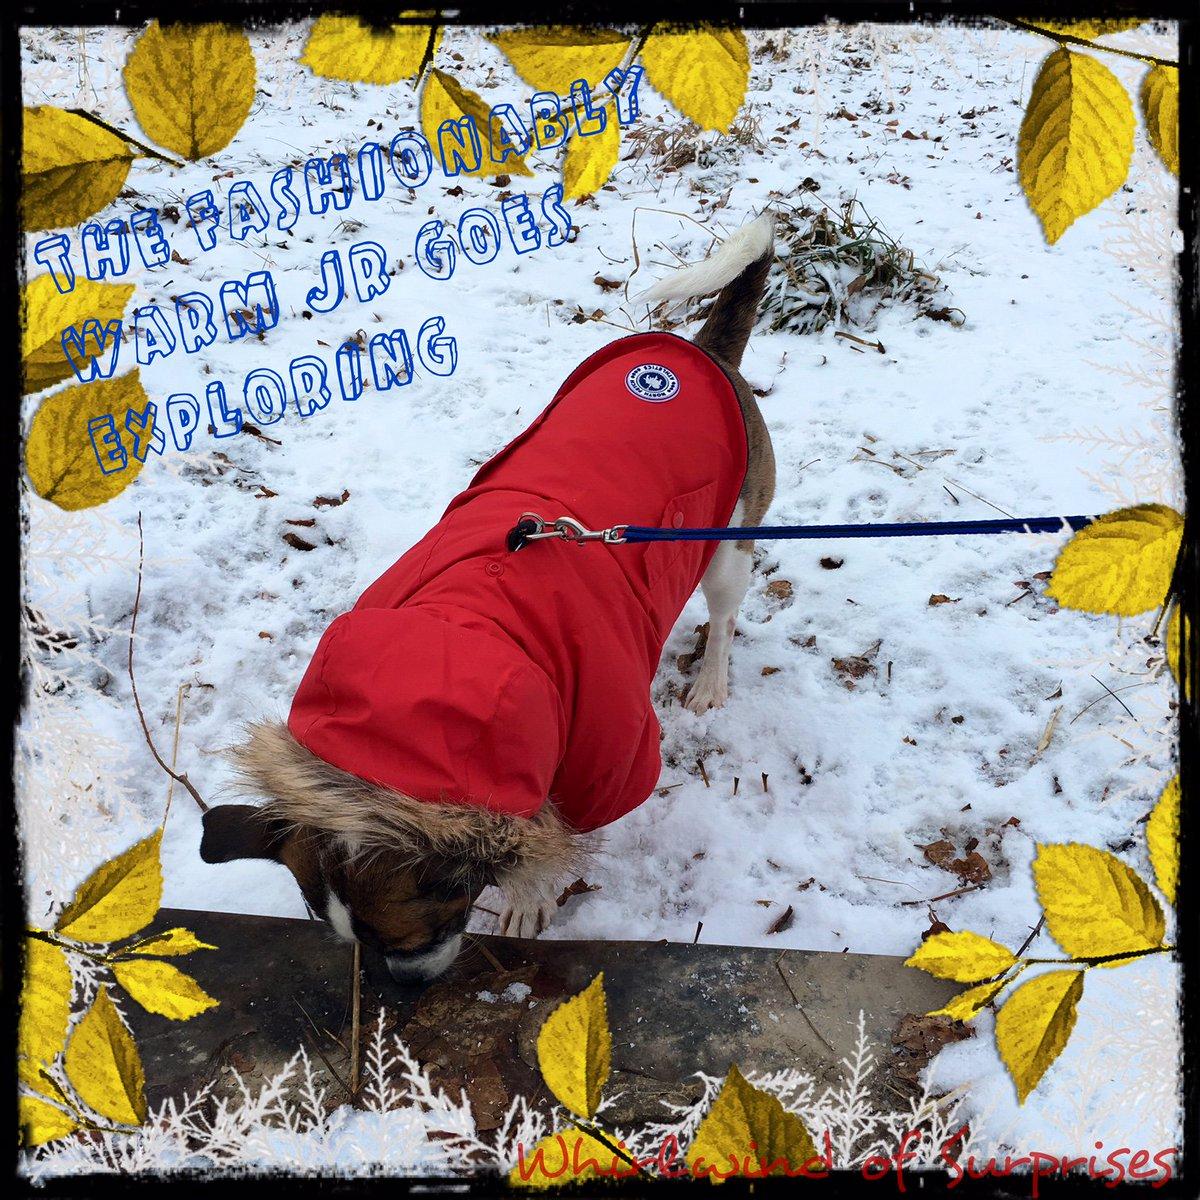 Jack Russell winter jackets